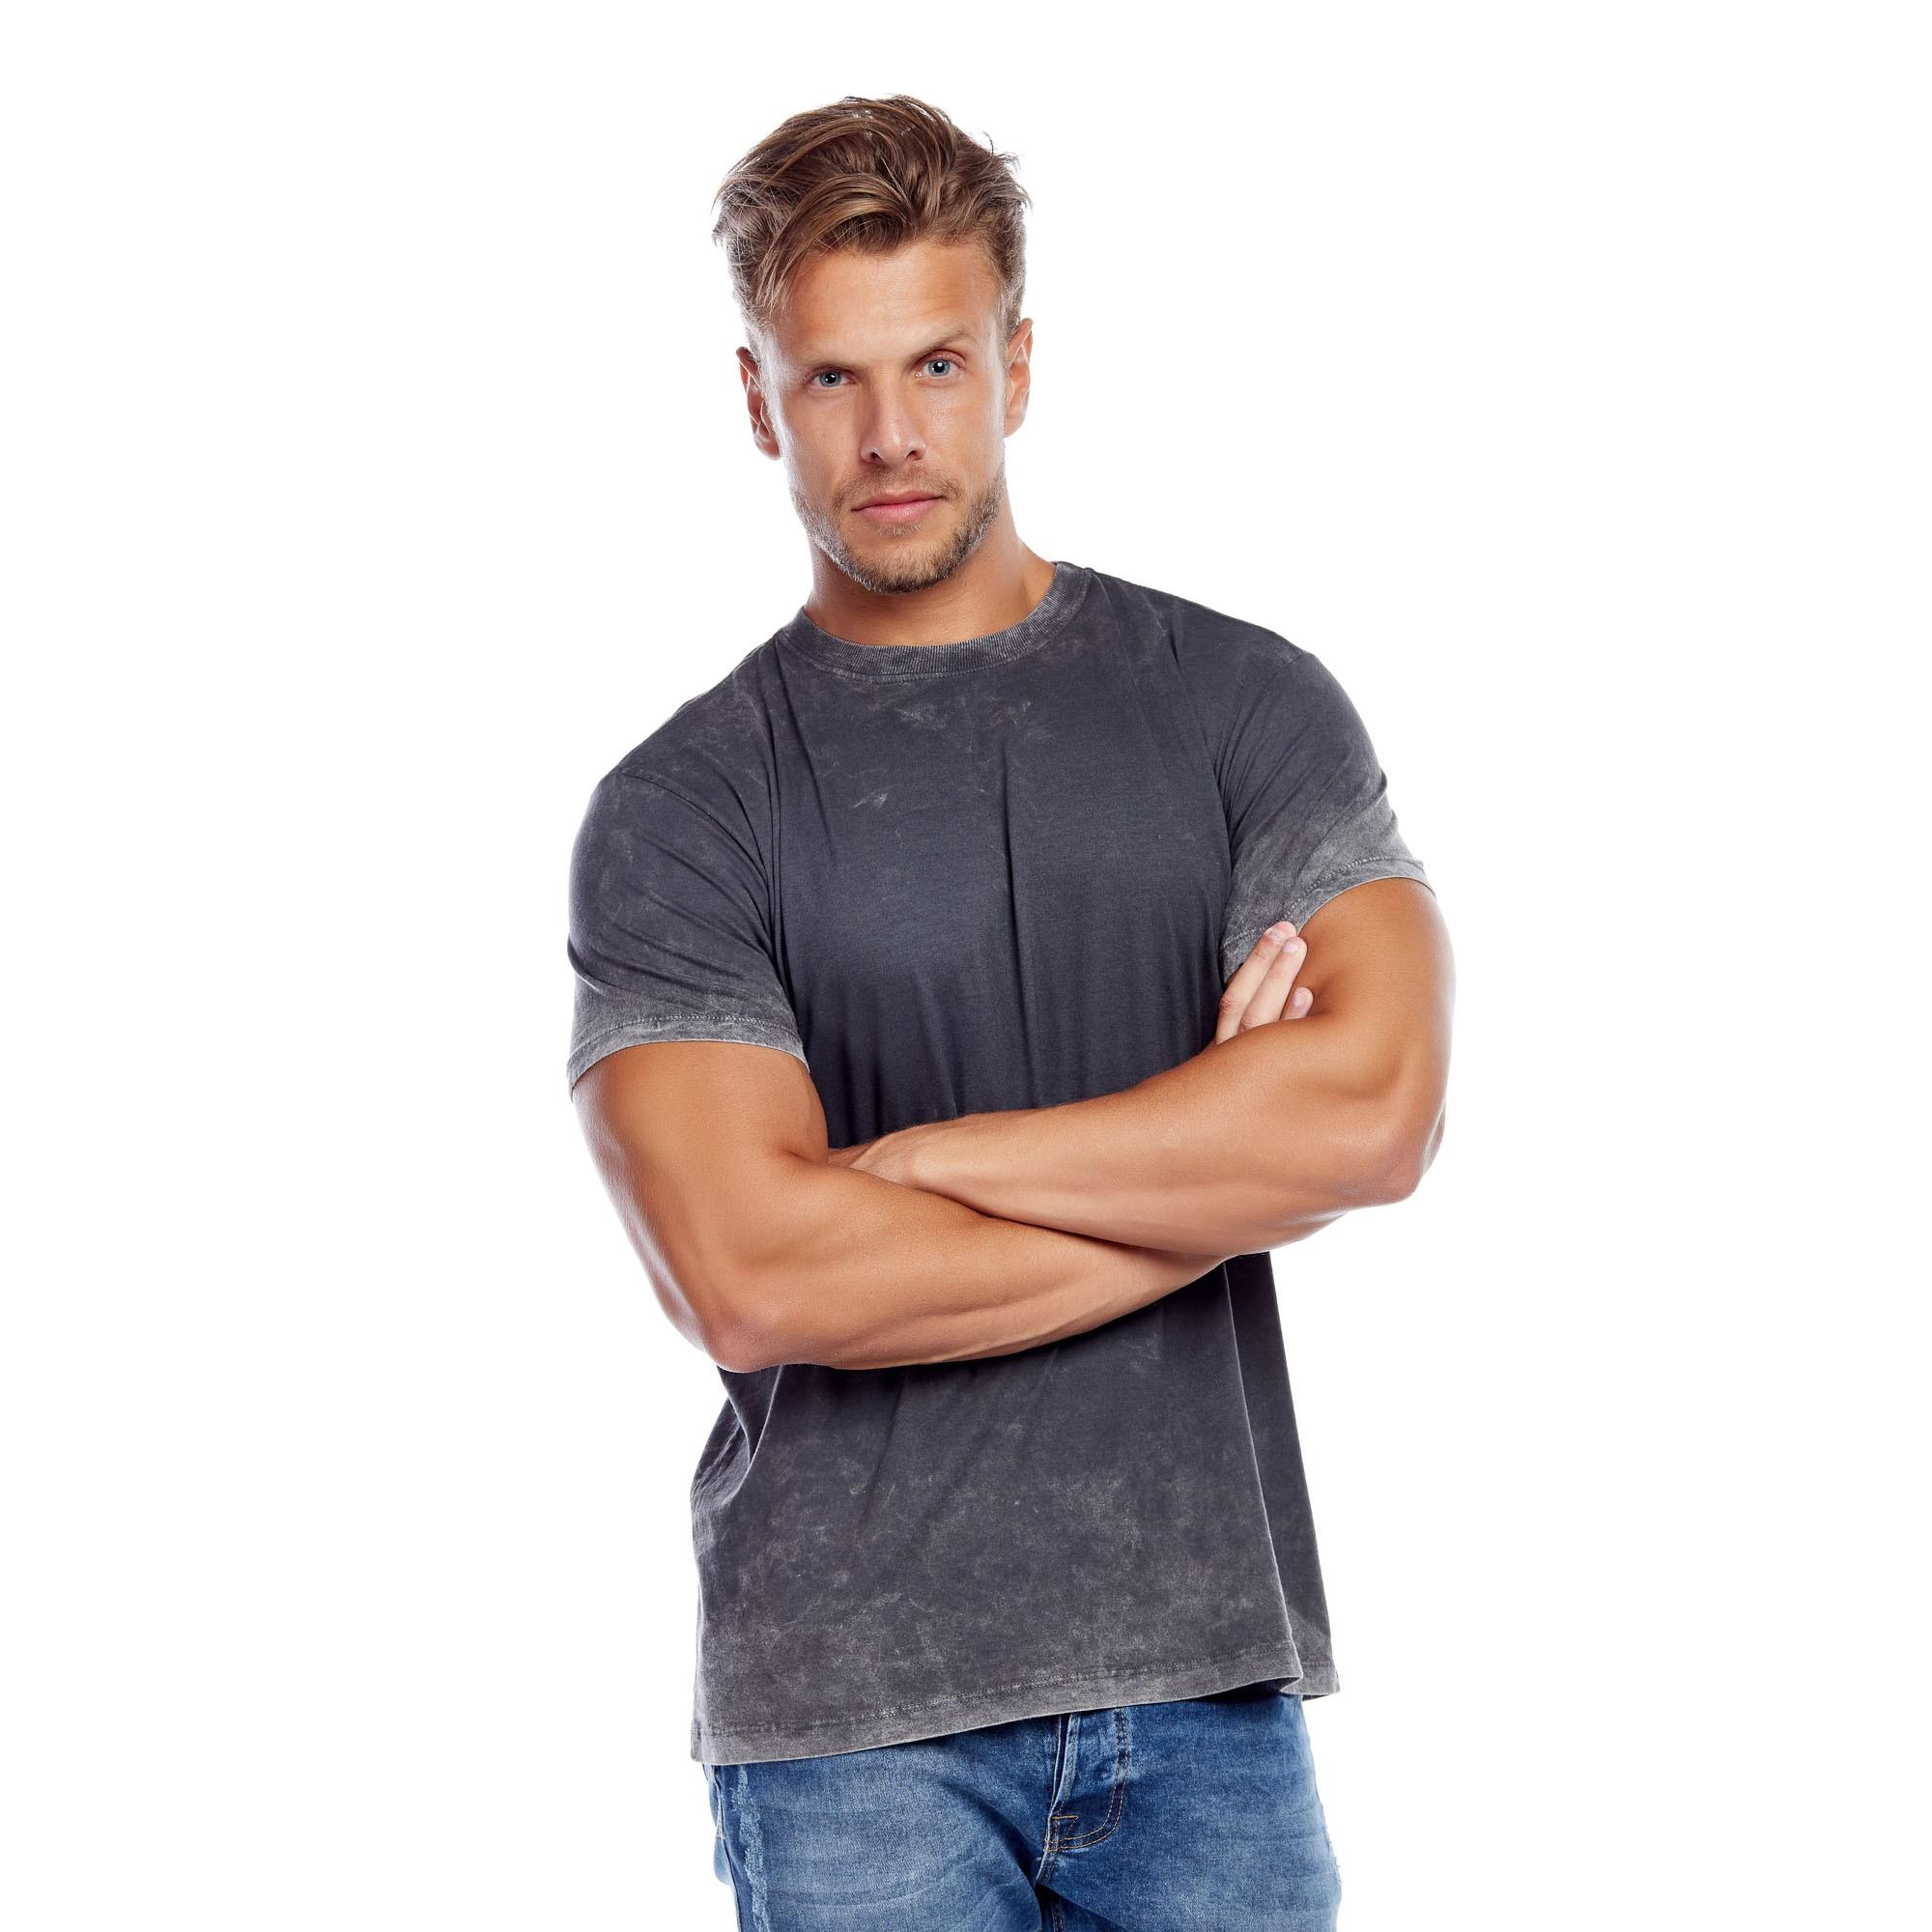 Camiseta Masculina Marmorizada do Avesso Evolvee